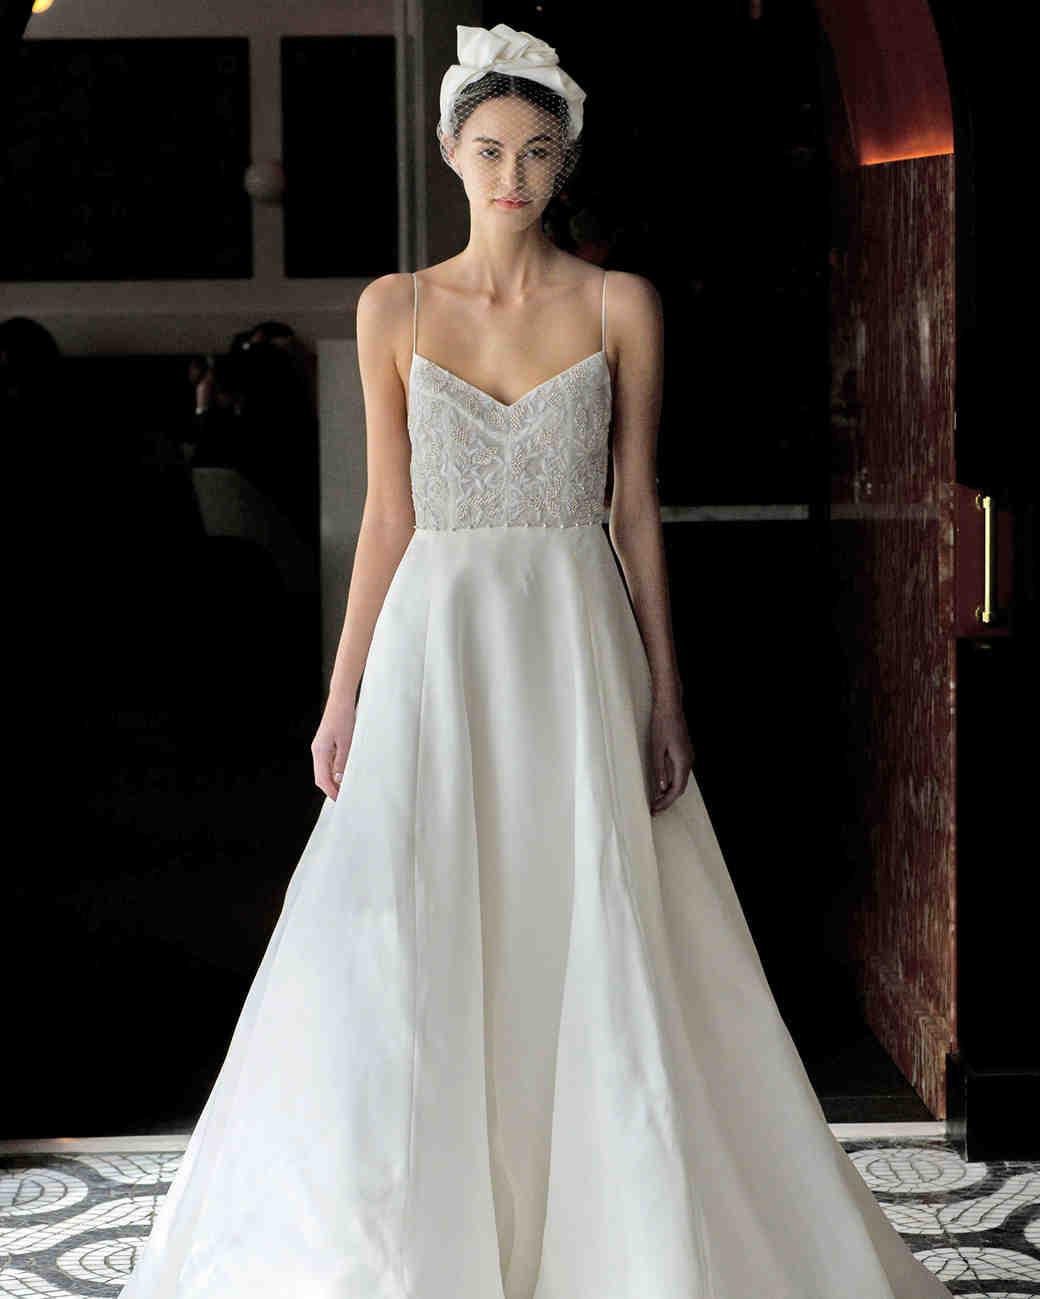 Lela rose circle lace peplum dress